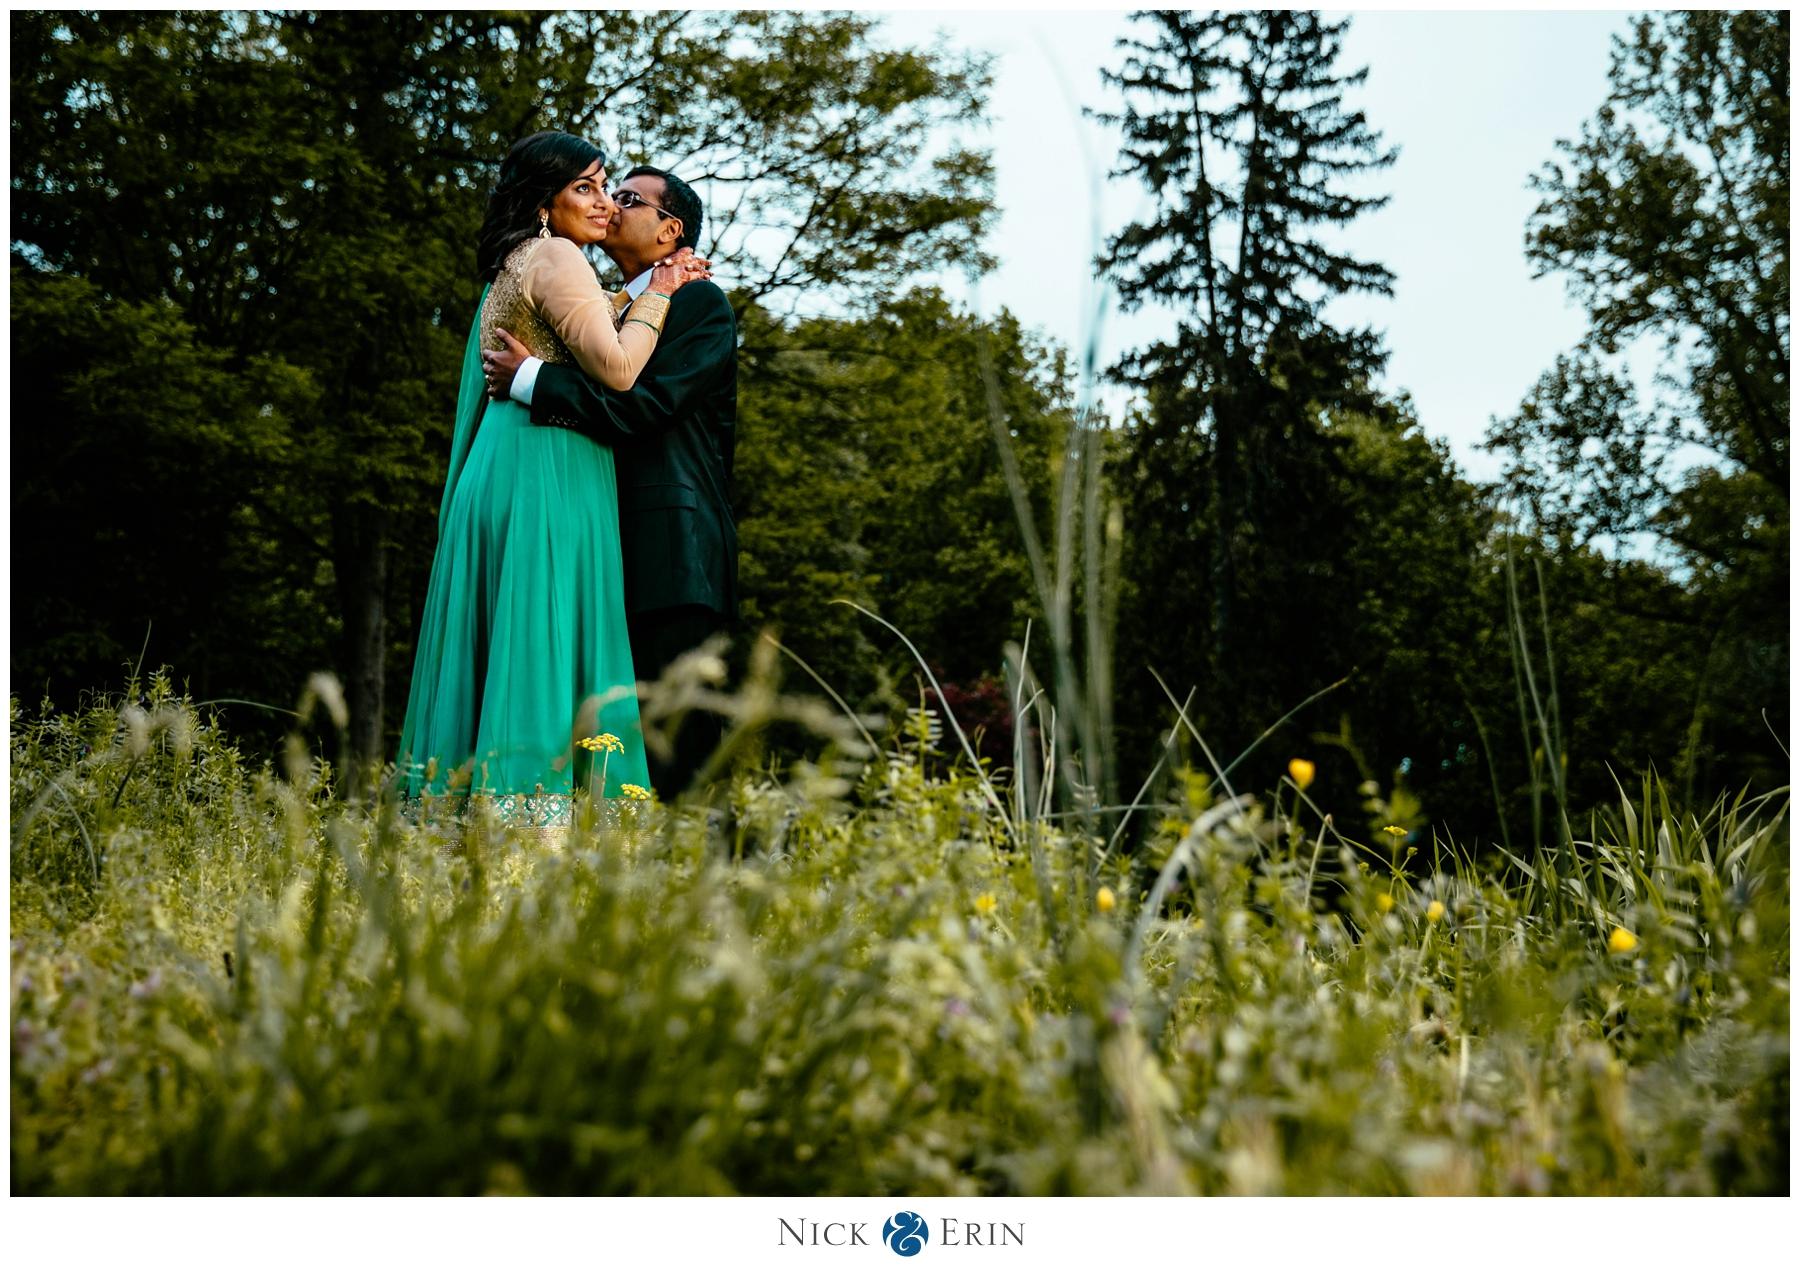 Donner_Photography_Arlington VA Wedding_Amrith and Aleefia_00010